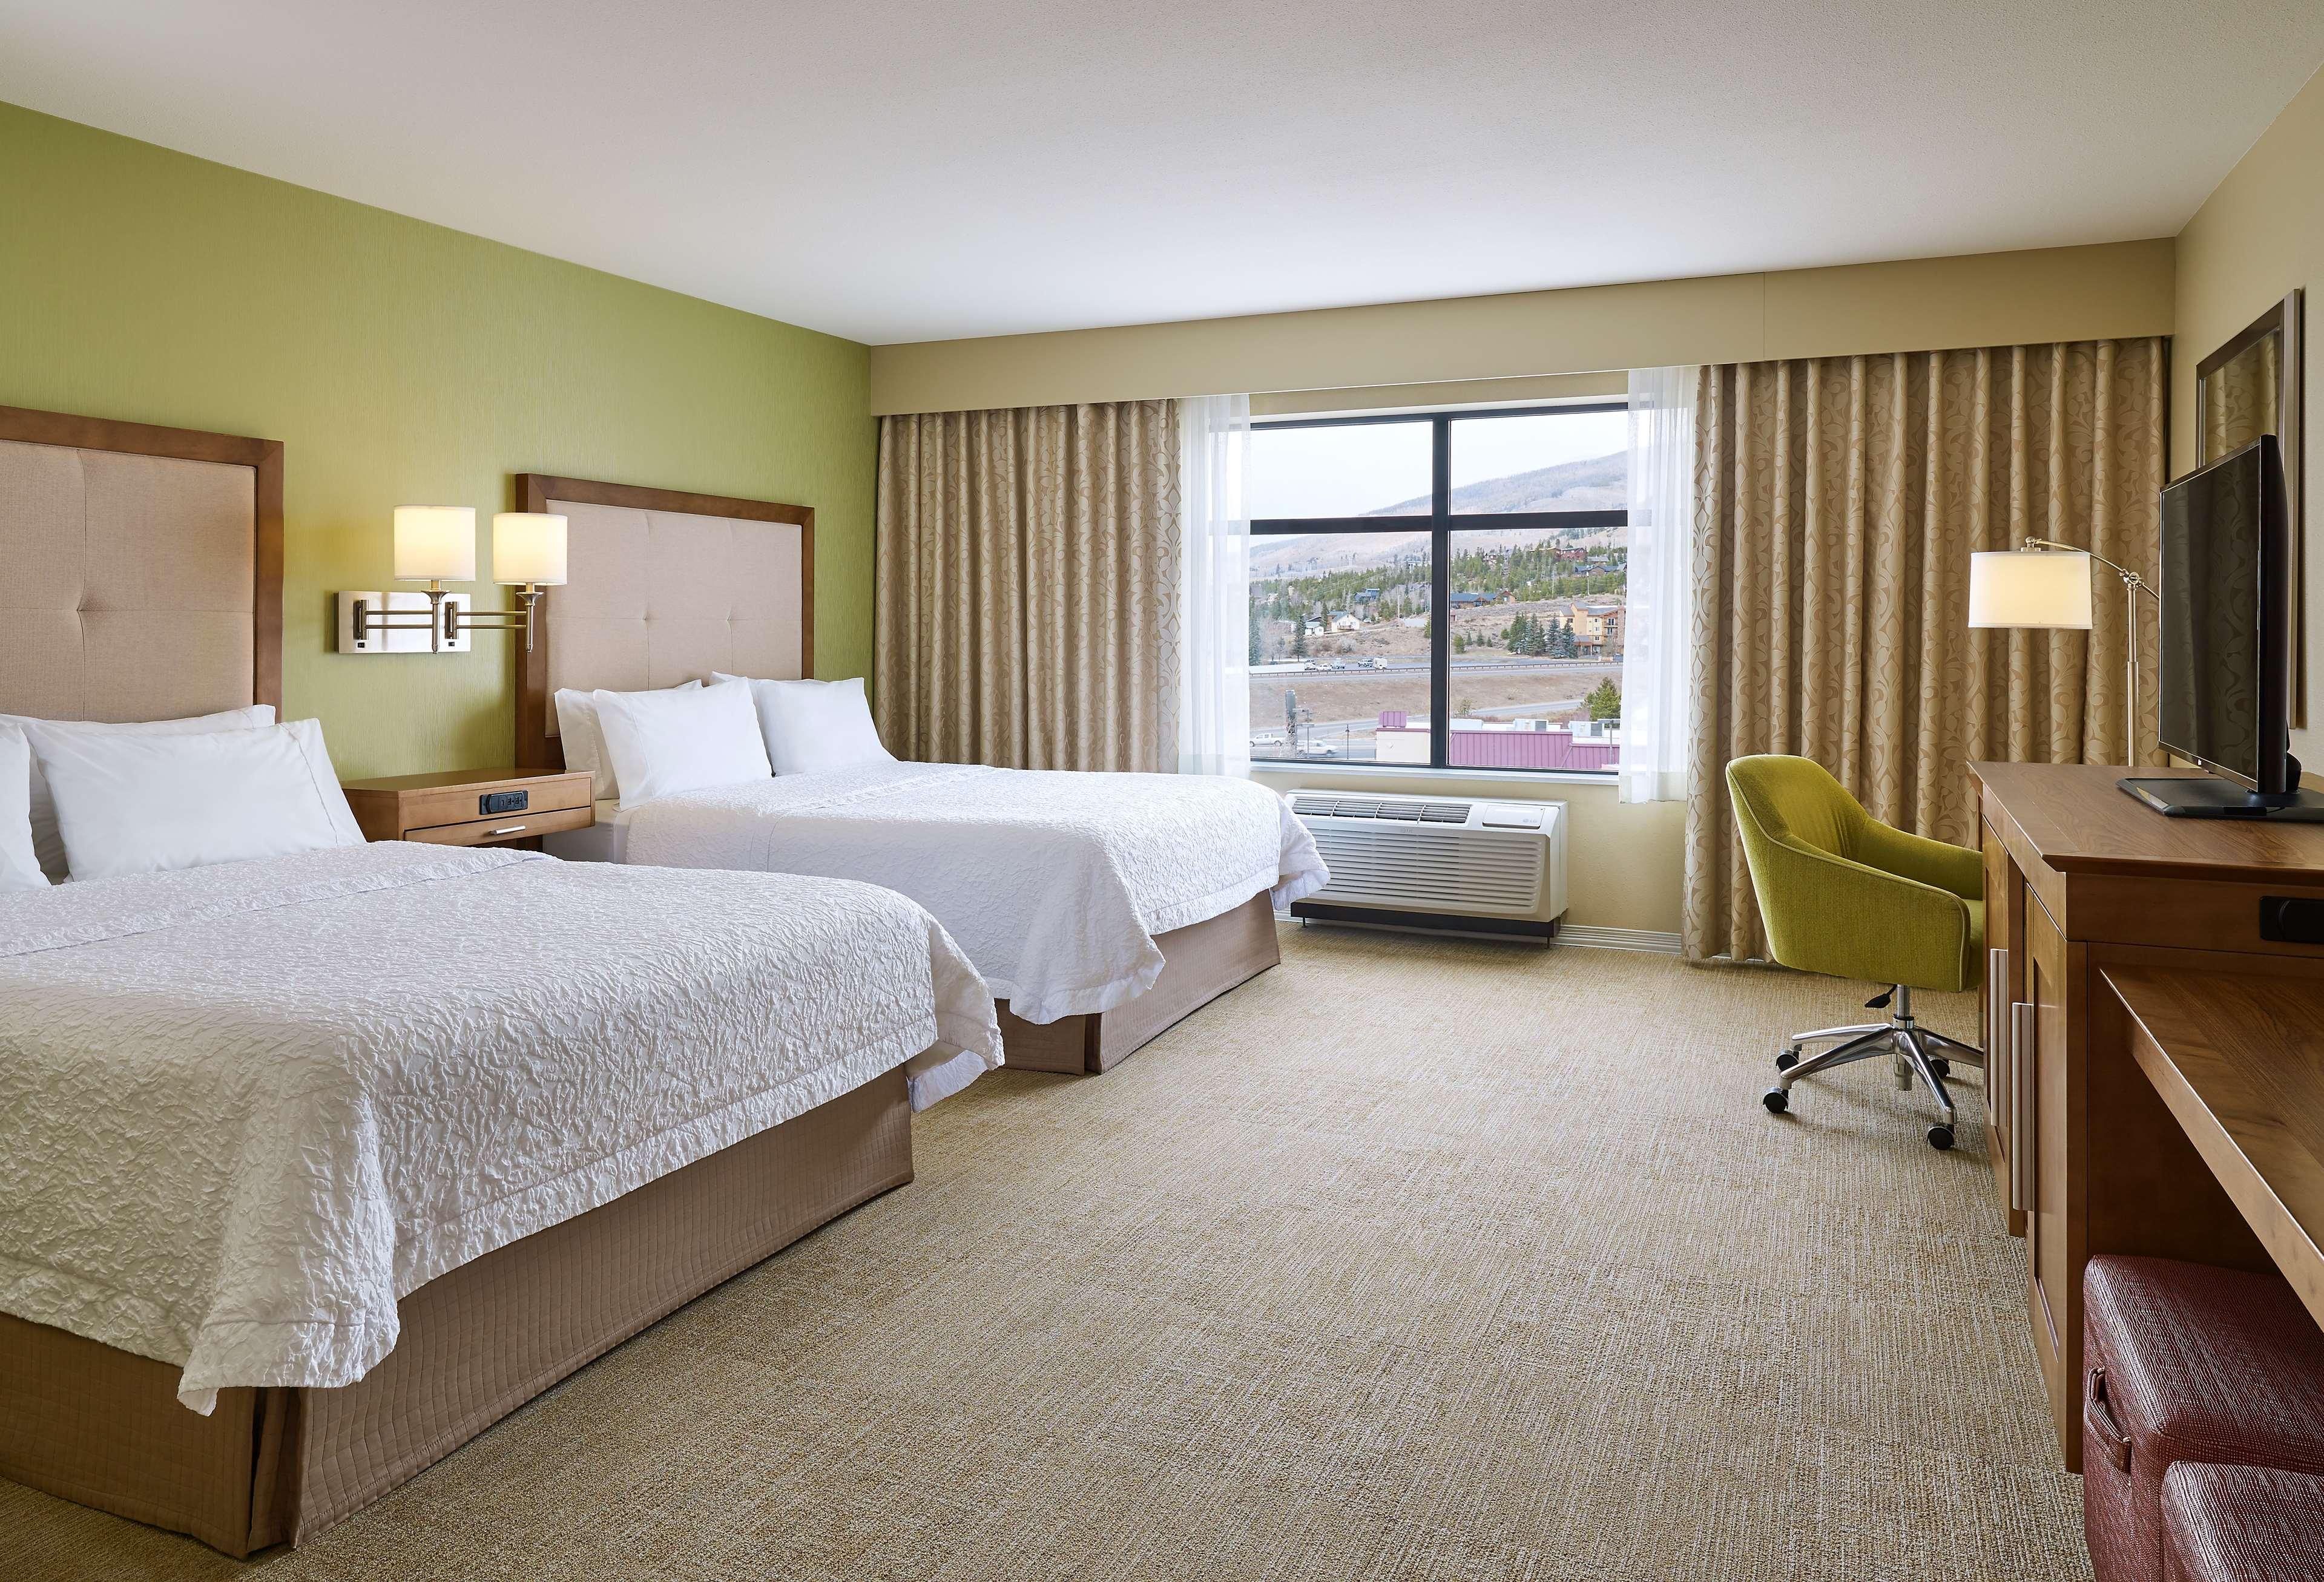 Hampton Inn & Suites Silverthorne image 33